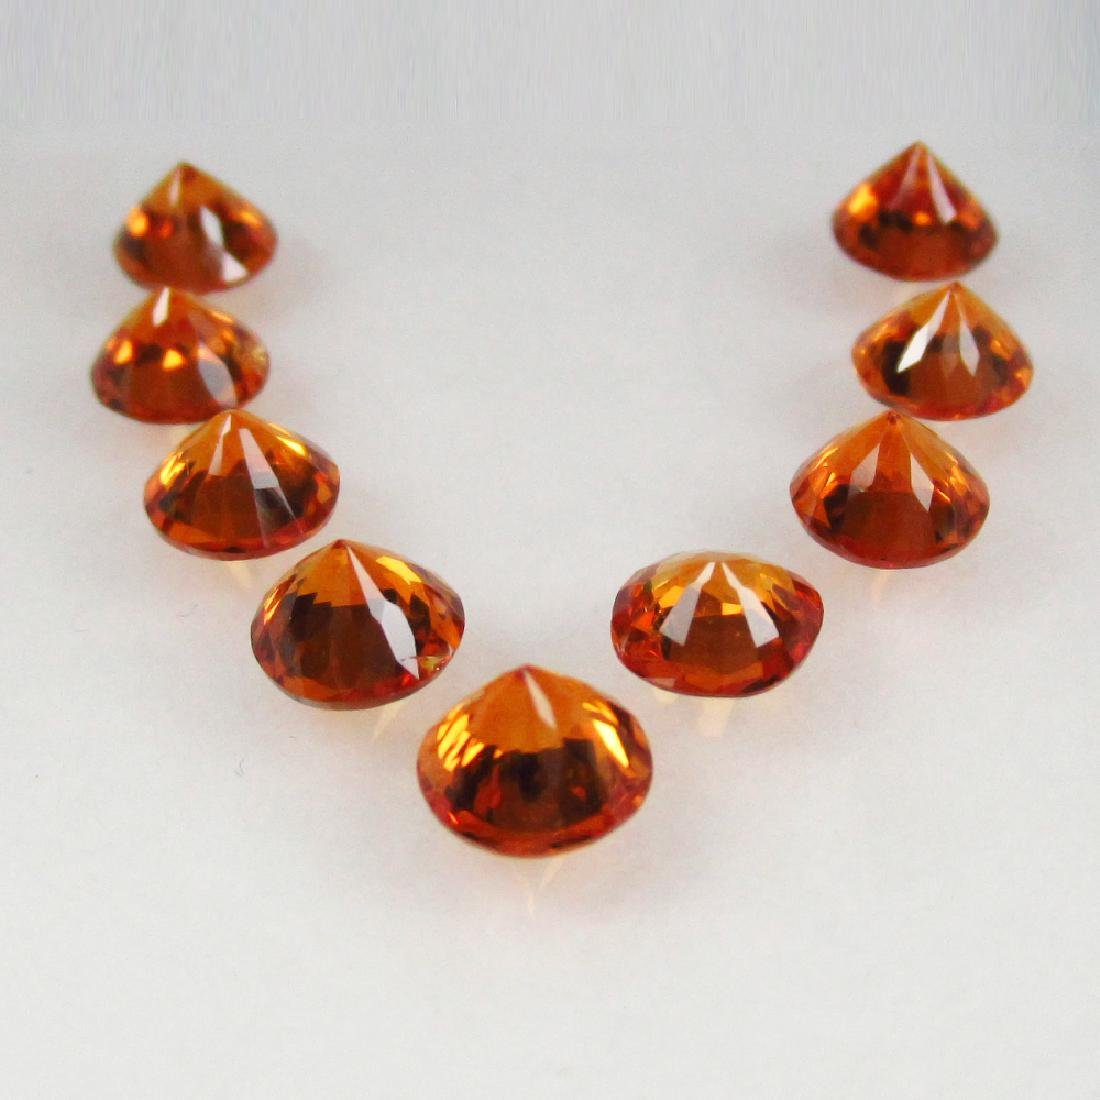 4.69 Ct 9 Loose Spessartine Garnet Necklace Set - 3